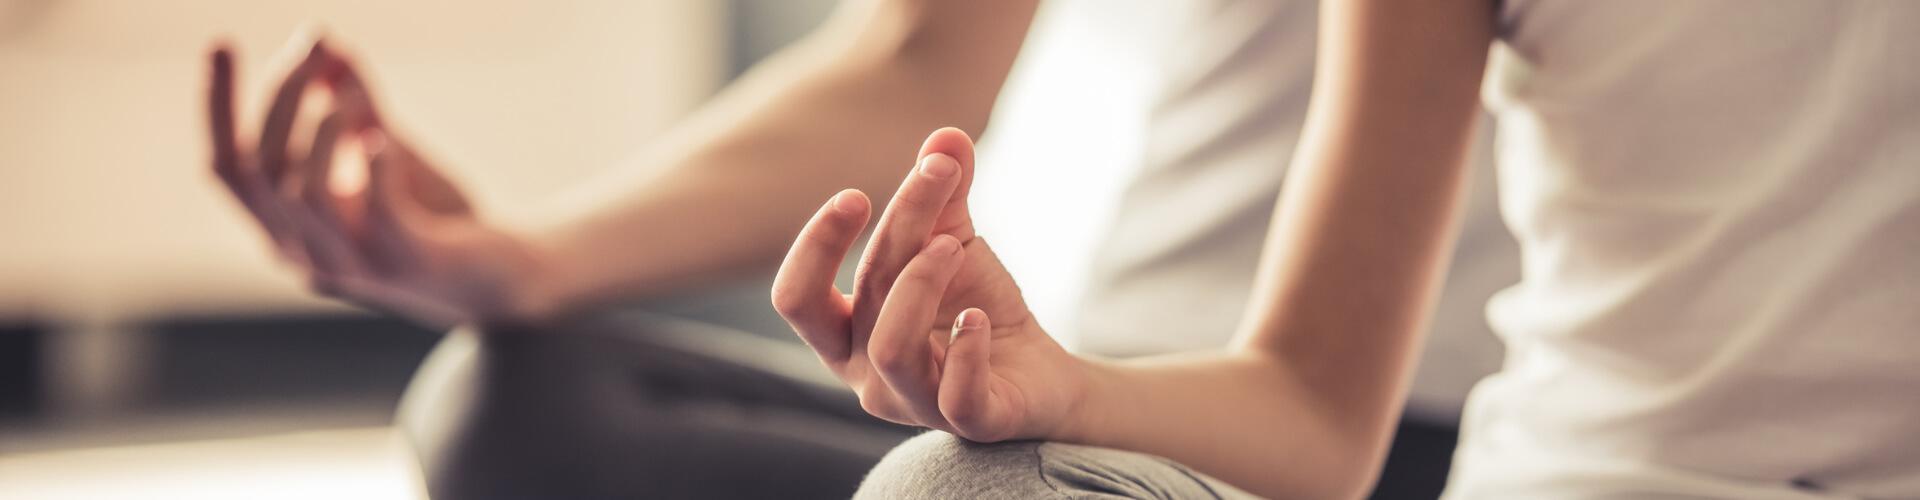 Live-Online-Yogakurs mit dem TherapieCentrum Fred Elges Herne